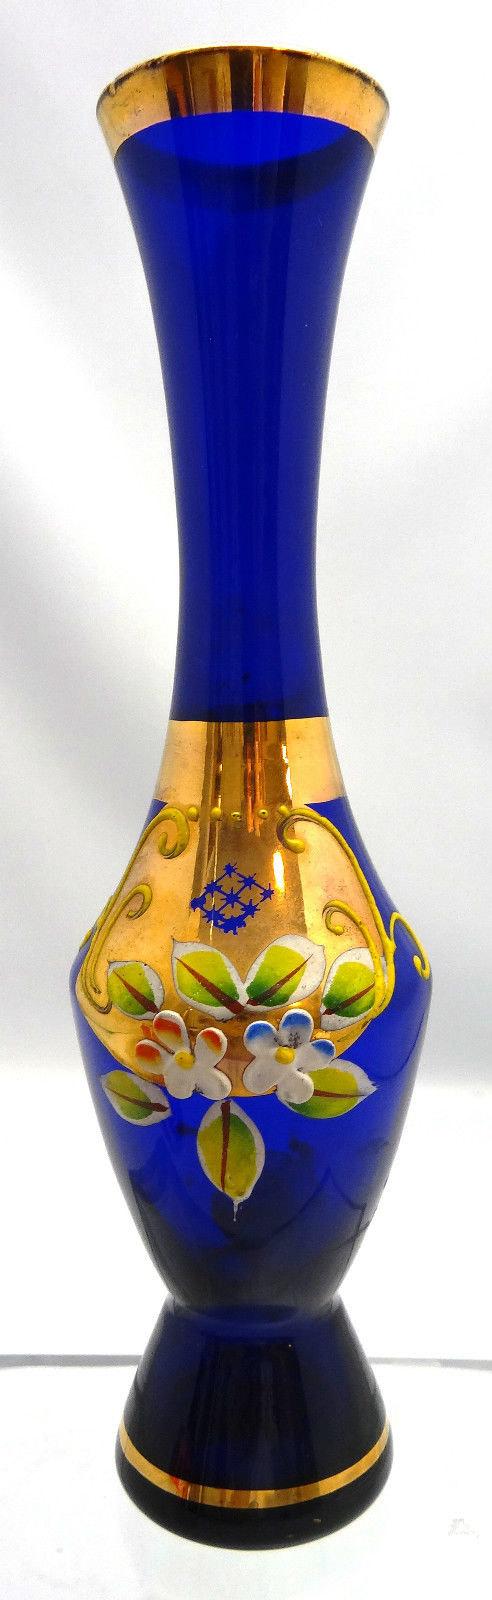 Vintage bohemian art glass bud vase vintage cobalt blue enamel vintage bohemian art glass bud vase vintage cobalt blue enamel floral design vase with gold reviewsmspy